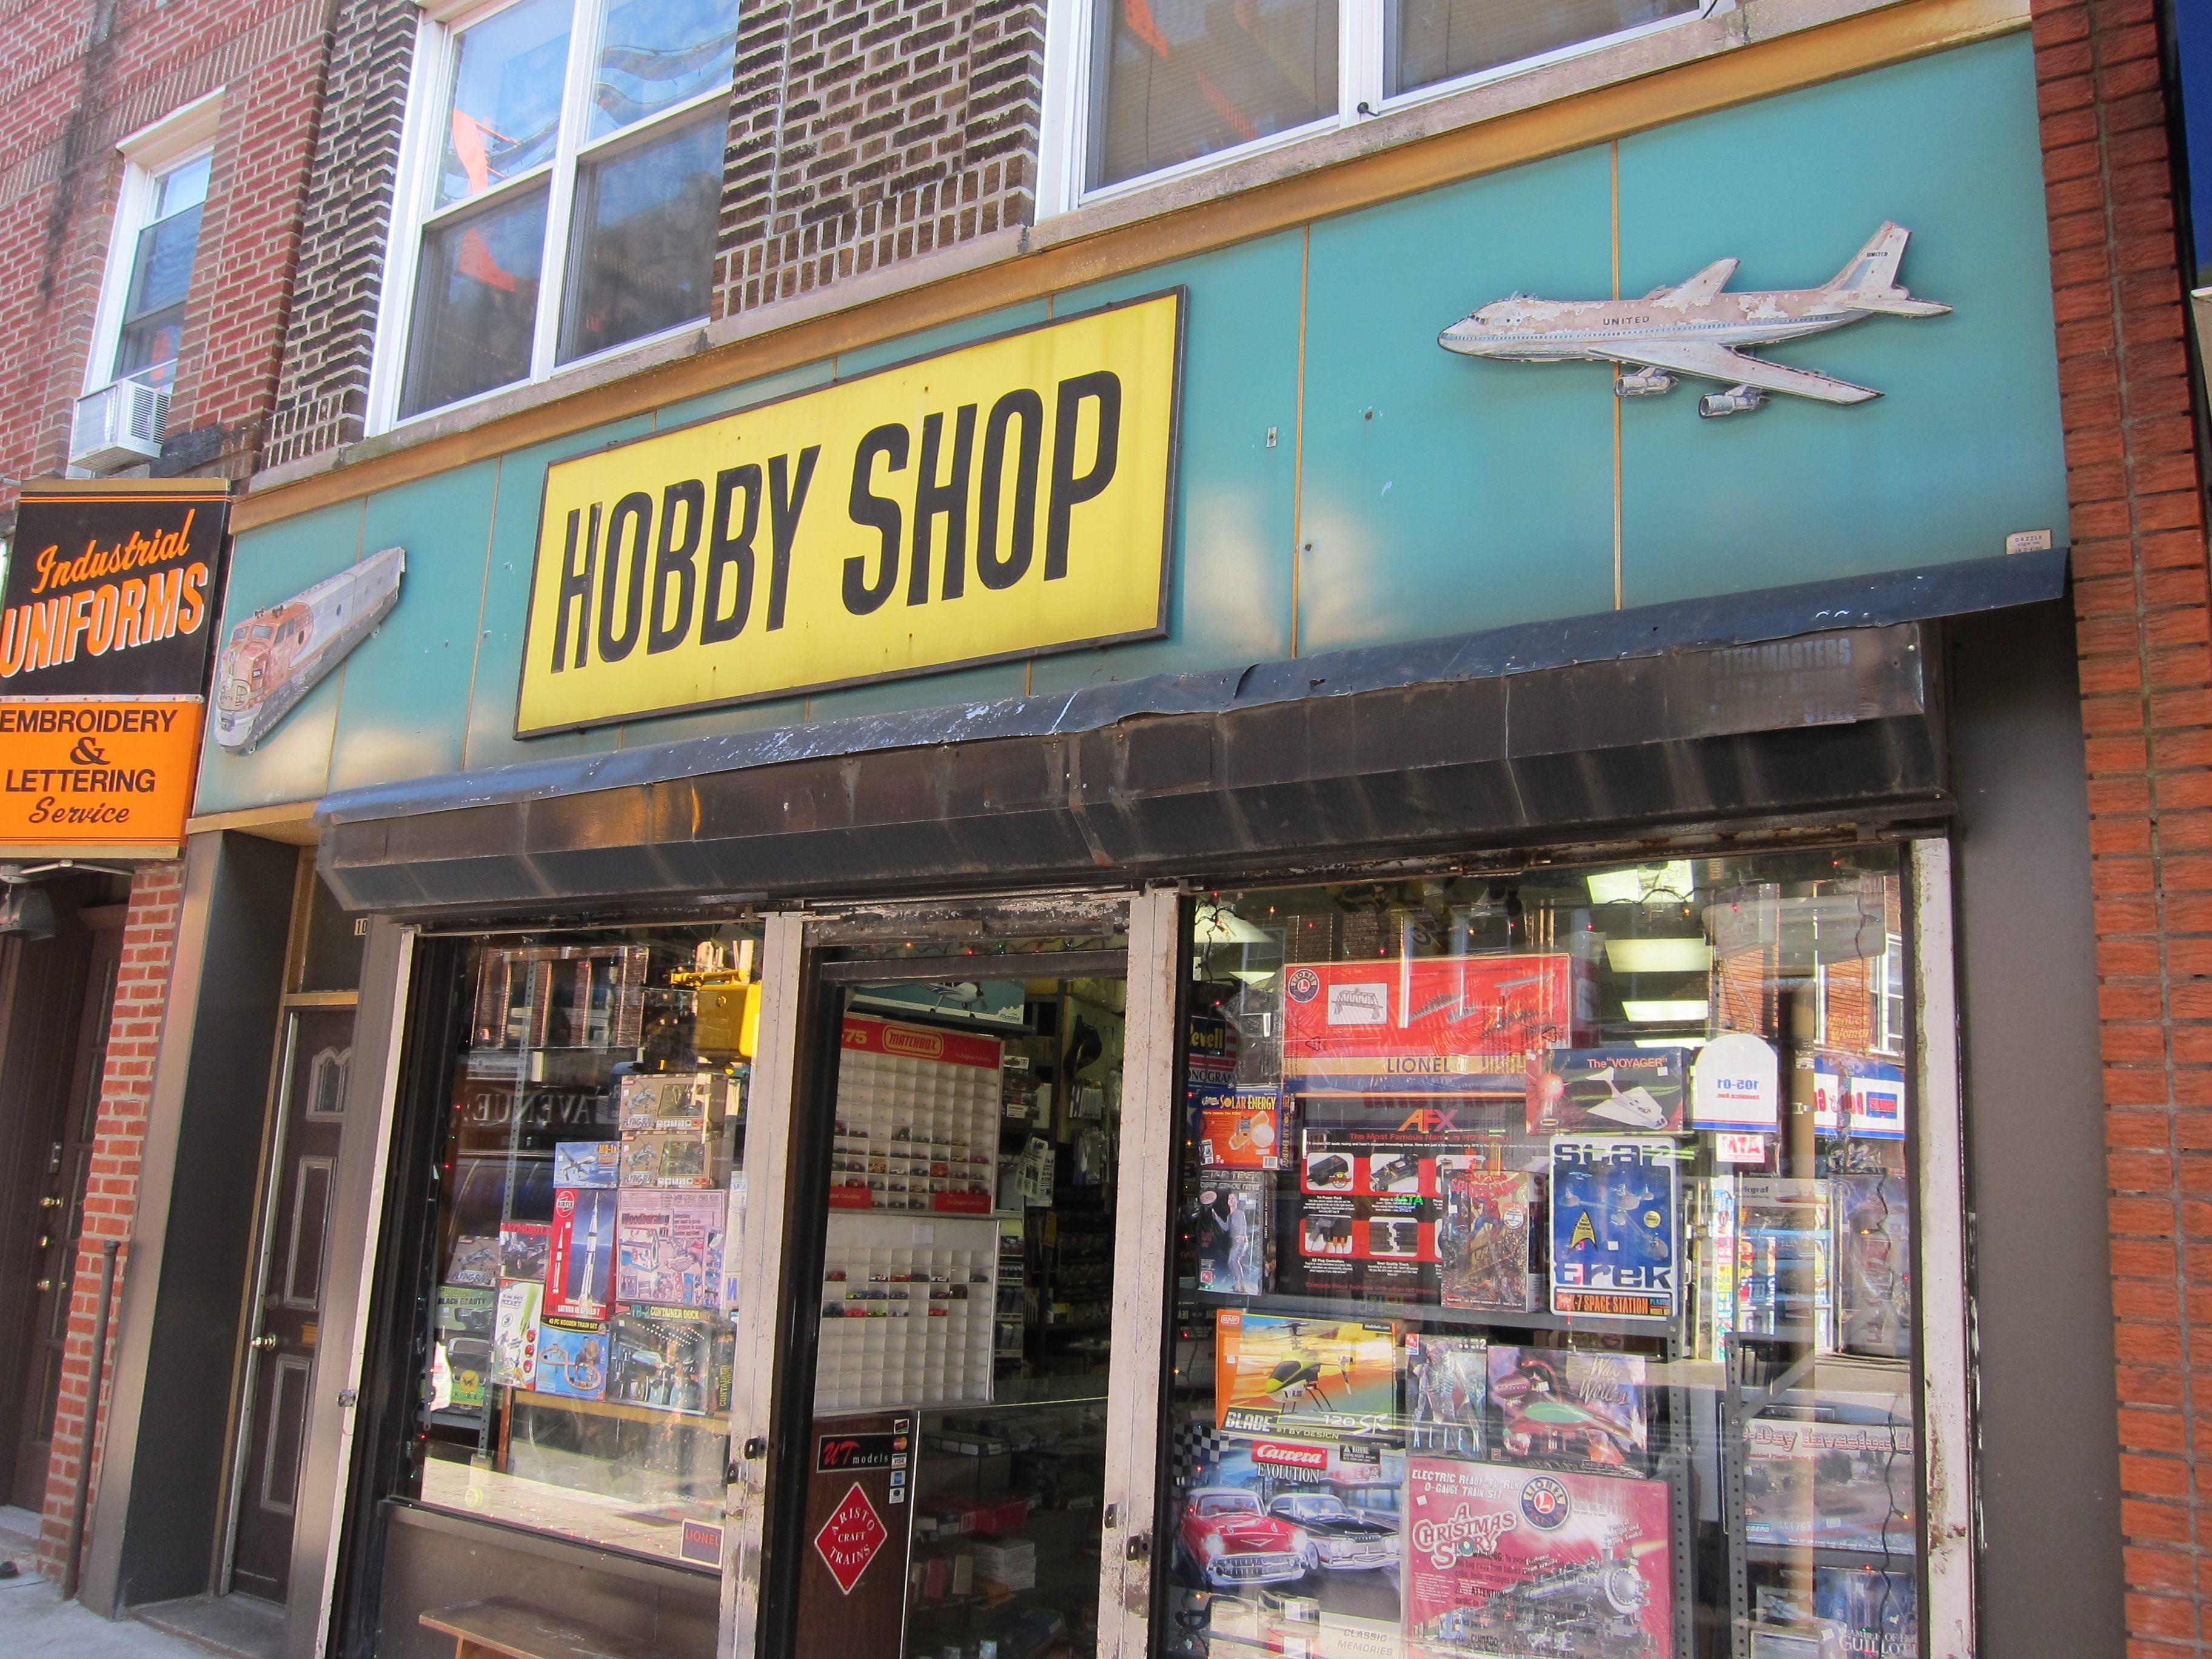 Jamaica Ave. Hobby Shop | Spots | Pinterest | Hobby shop, Models and Model car